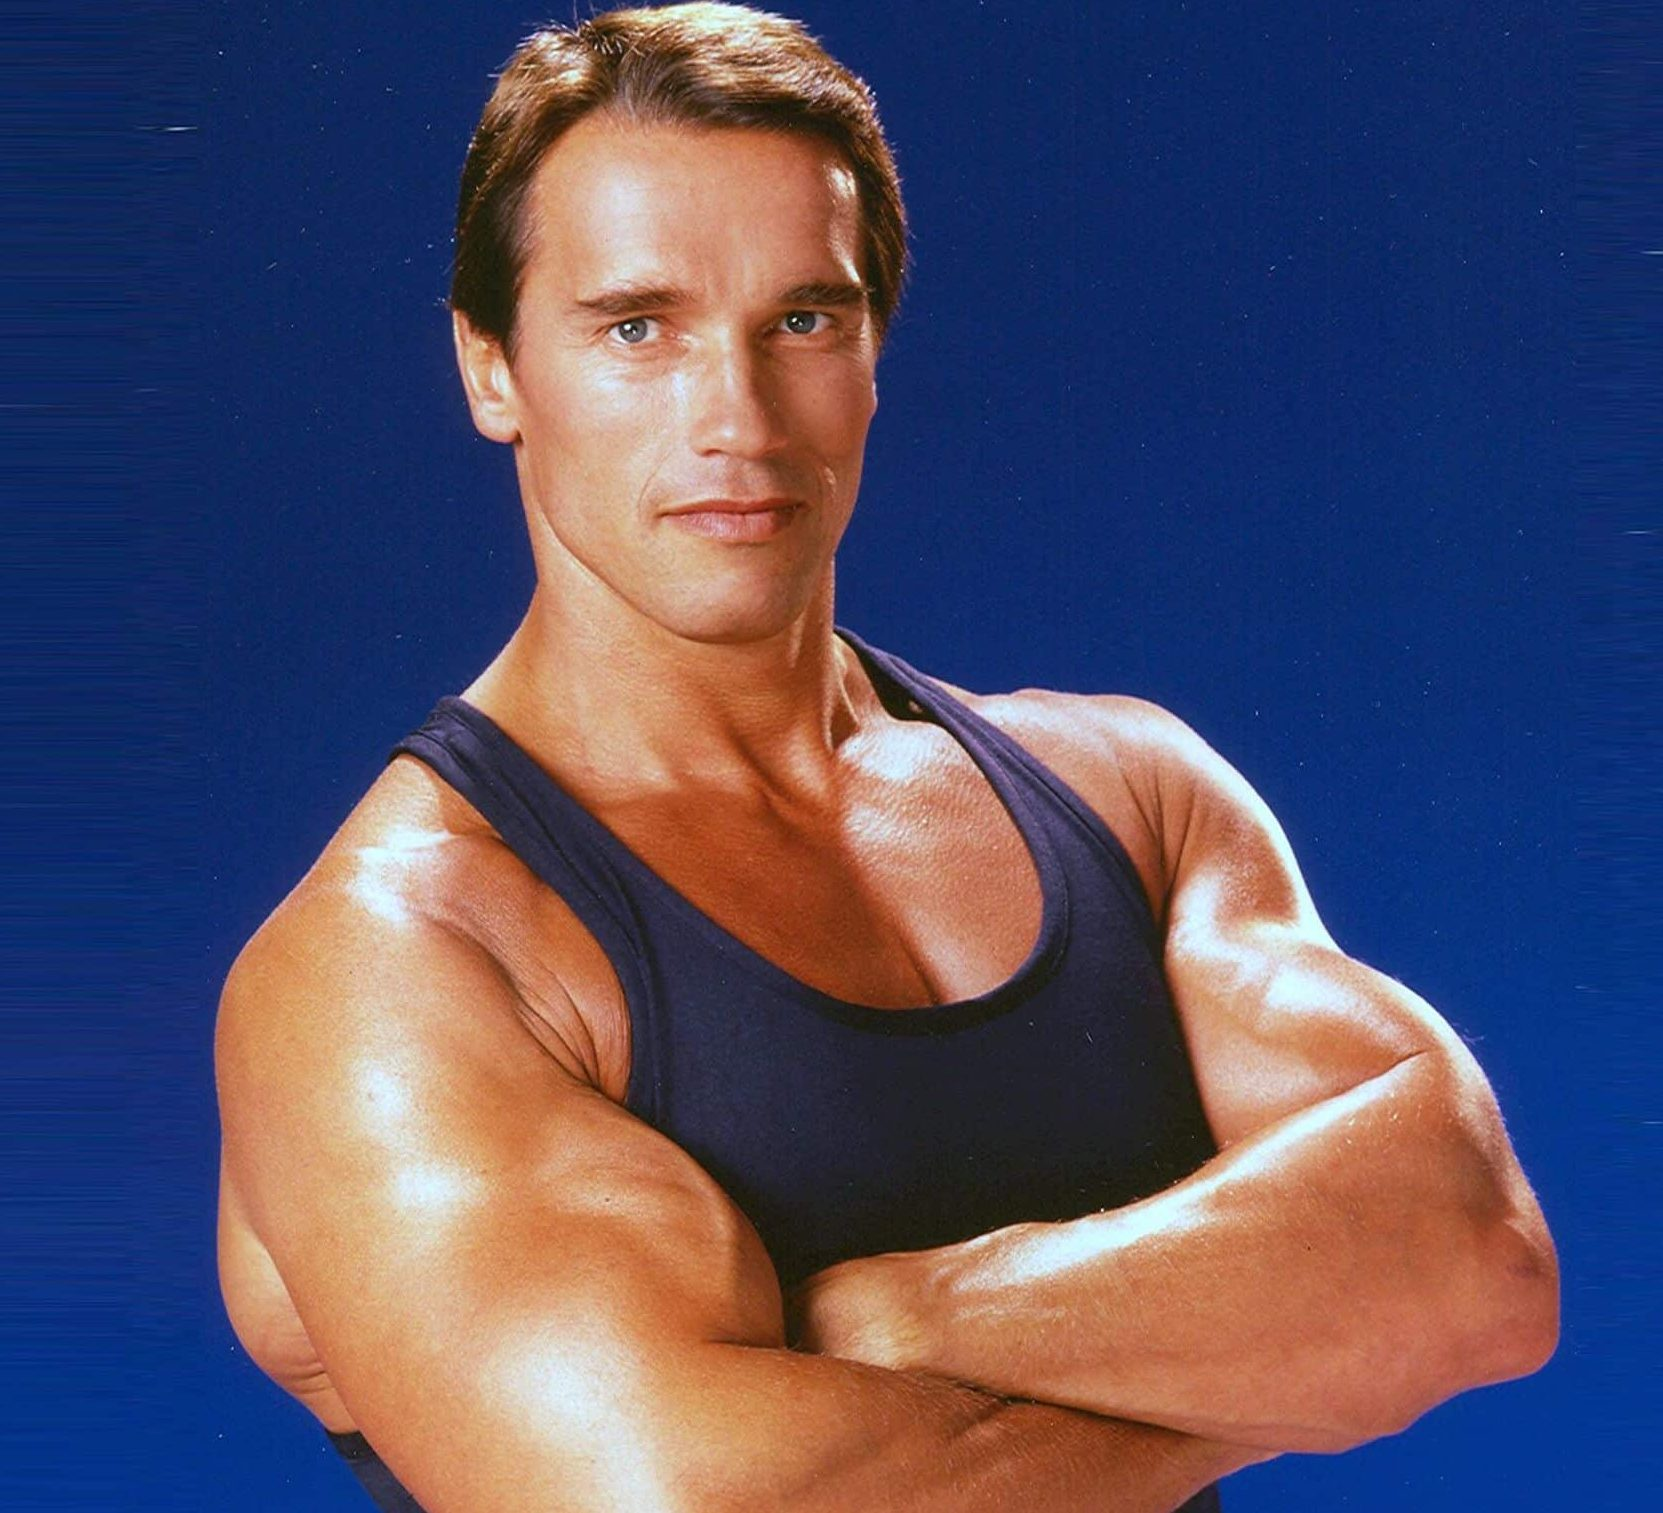 16 3 1 e1597833510554 20 Hilariously Wonderful Photos Of 80s Male TV Stars